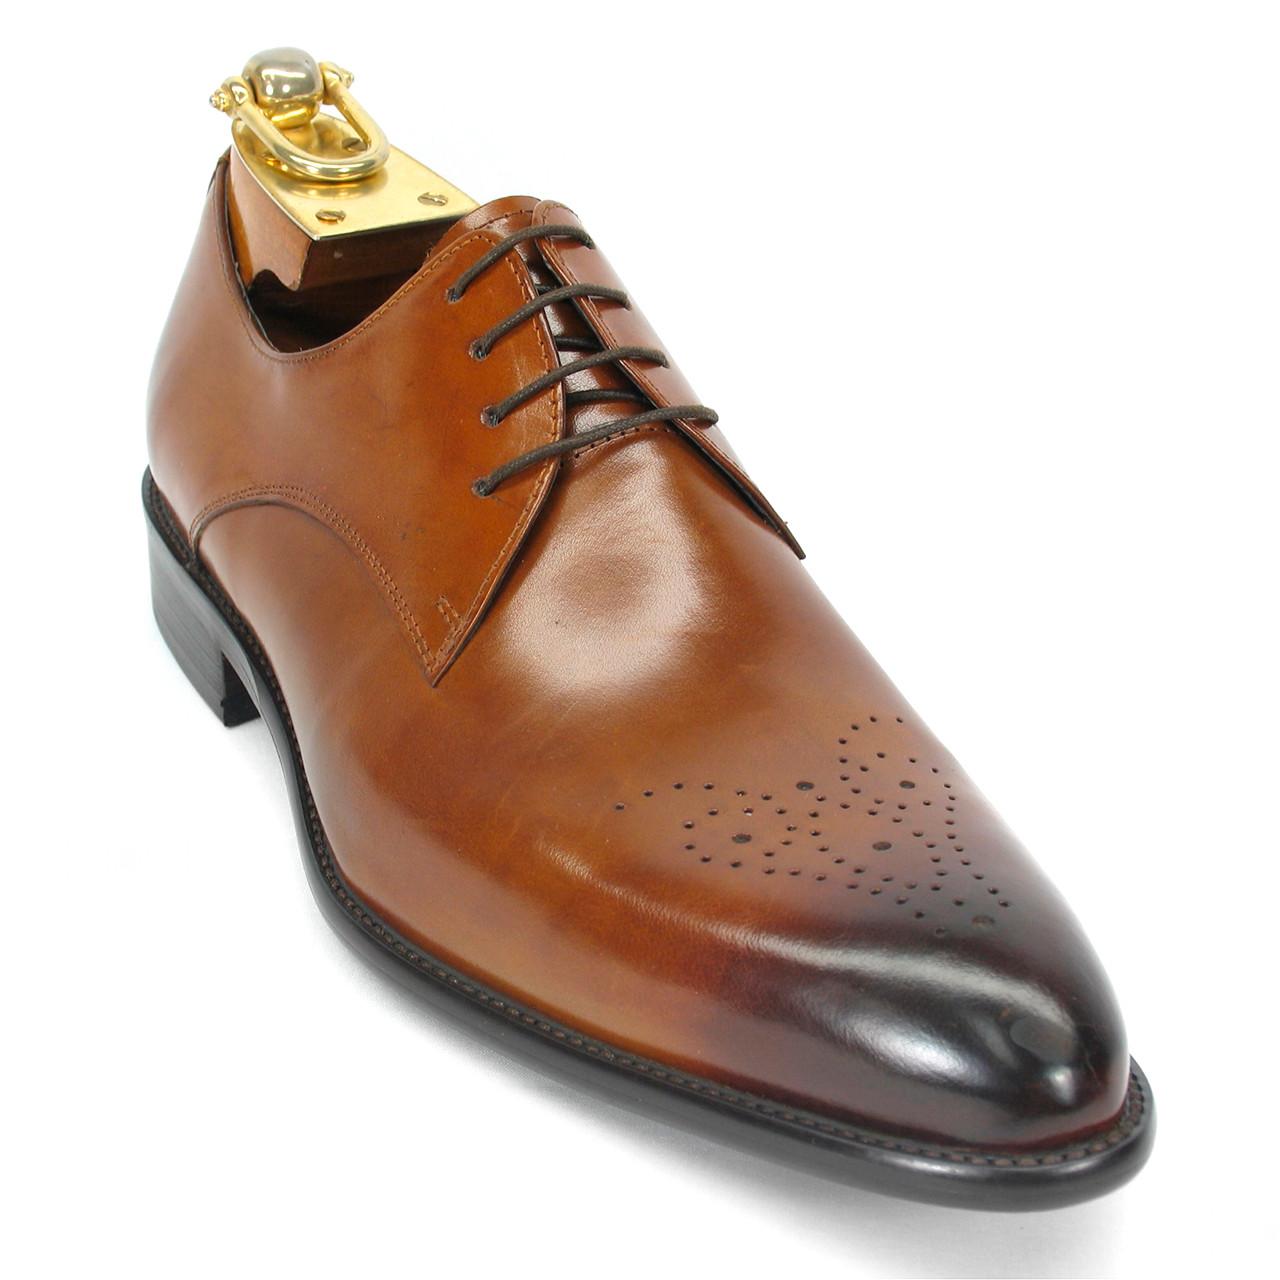 Carrucci Cognac Genuine Calfskin Leather Slip-ons